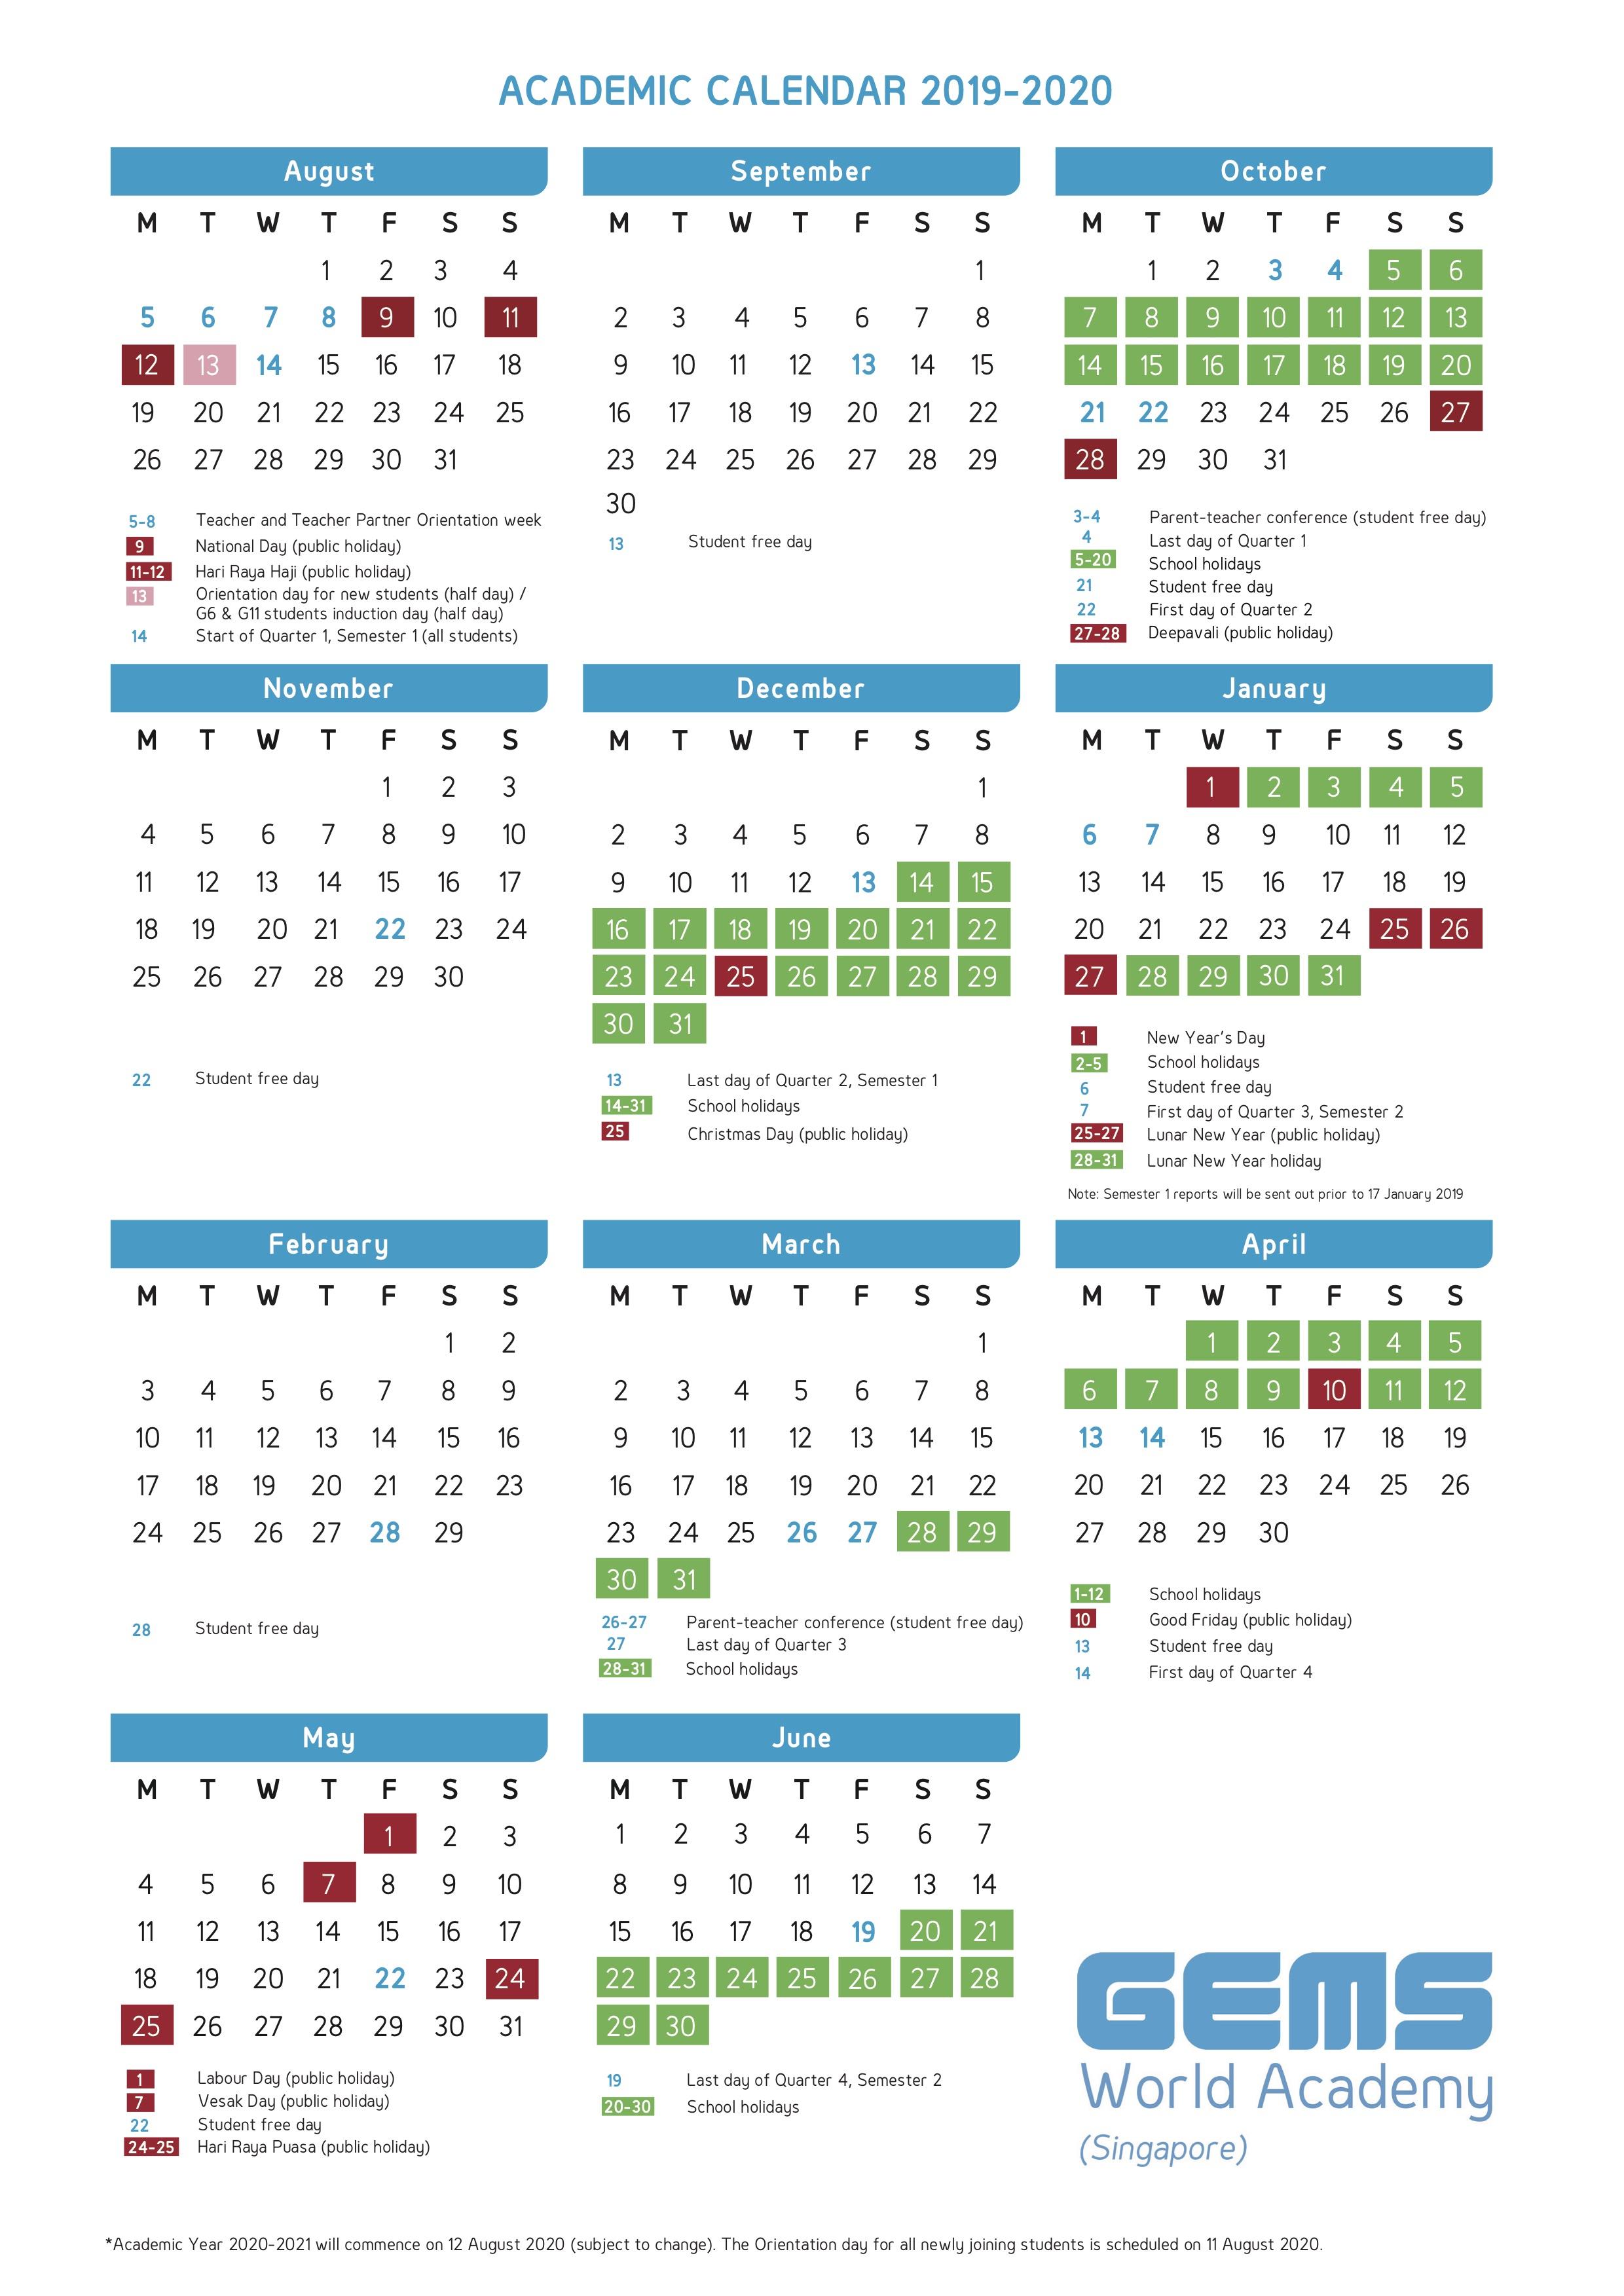 Academic Calendar | Gems World Academy (Singapore) within School Terms 2020 South Africa